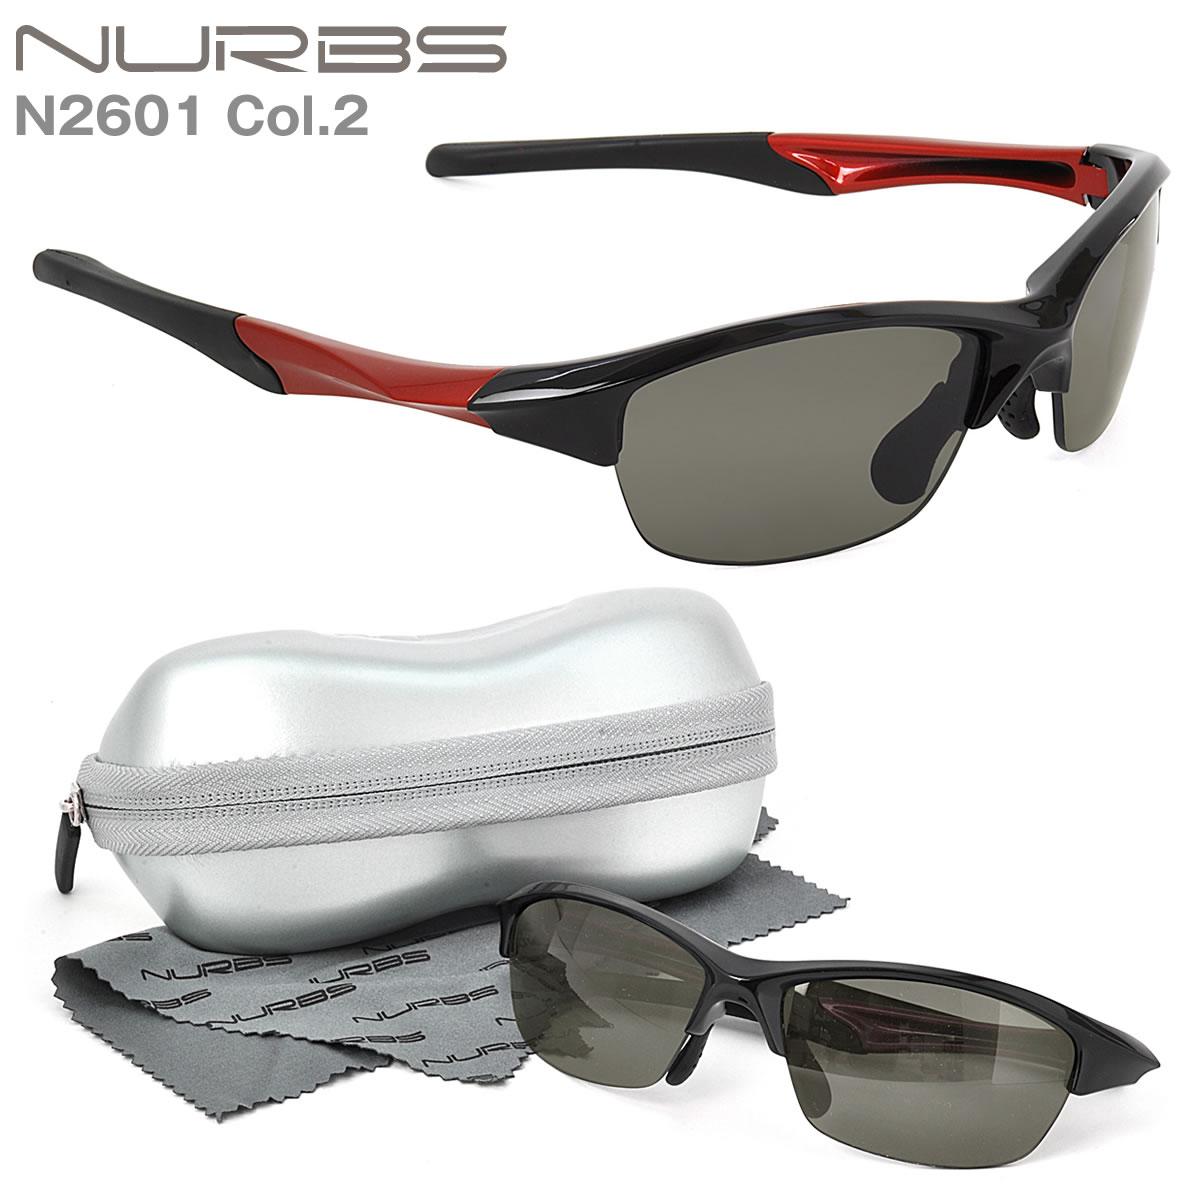 N2601 C2 Nurbs ヌーブス お度数付きスポーツサングラス